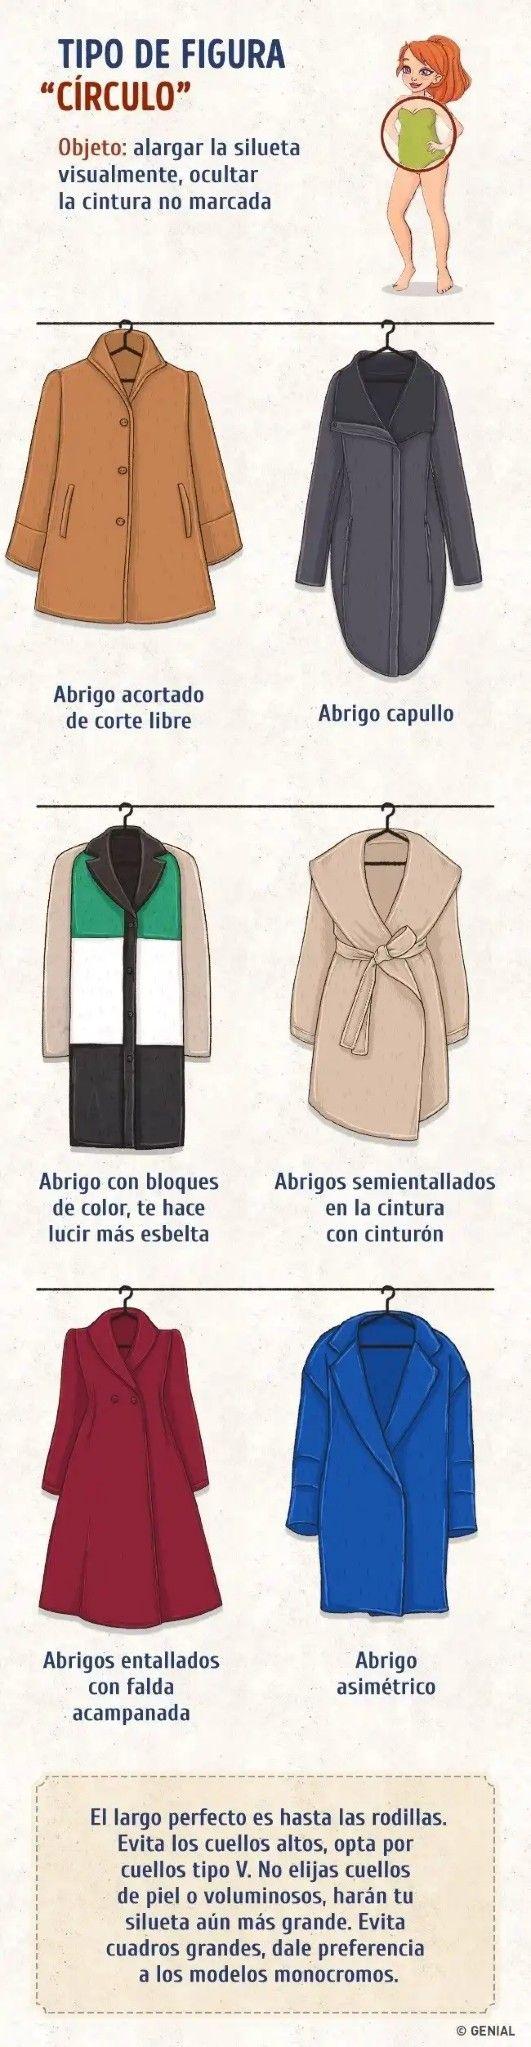 Pin de Seño Herrero en costura | Pinterest | Costura